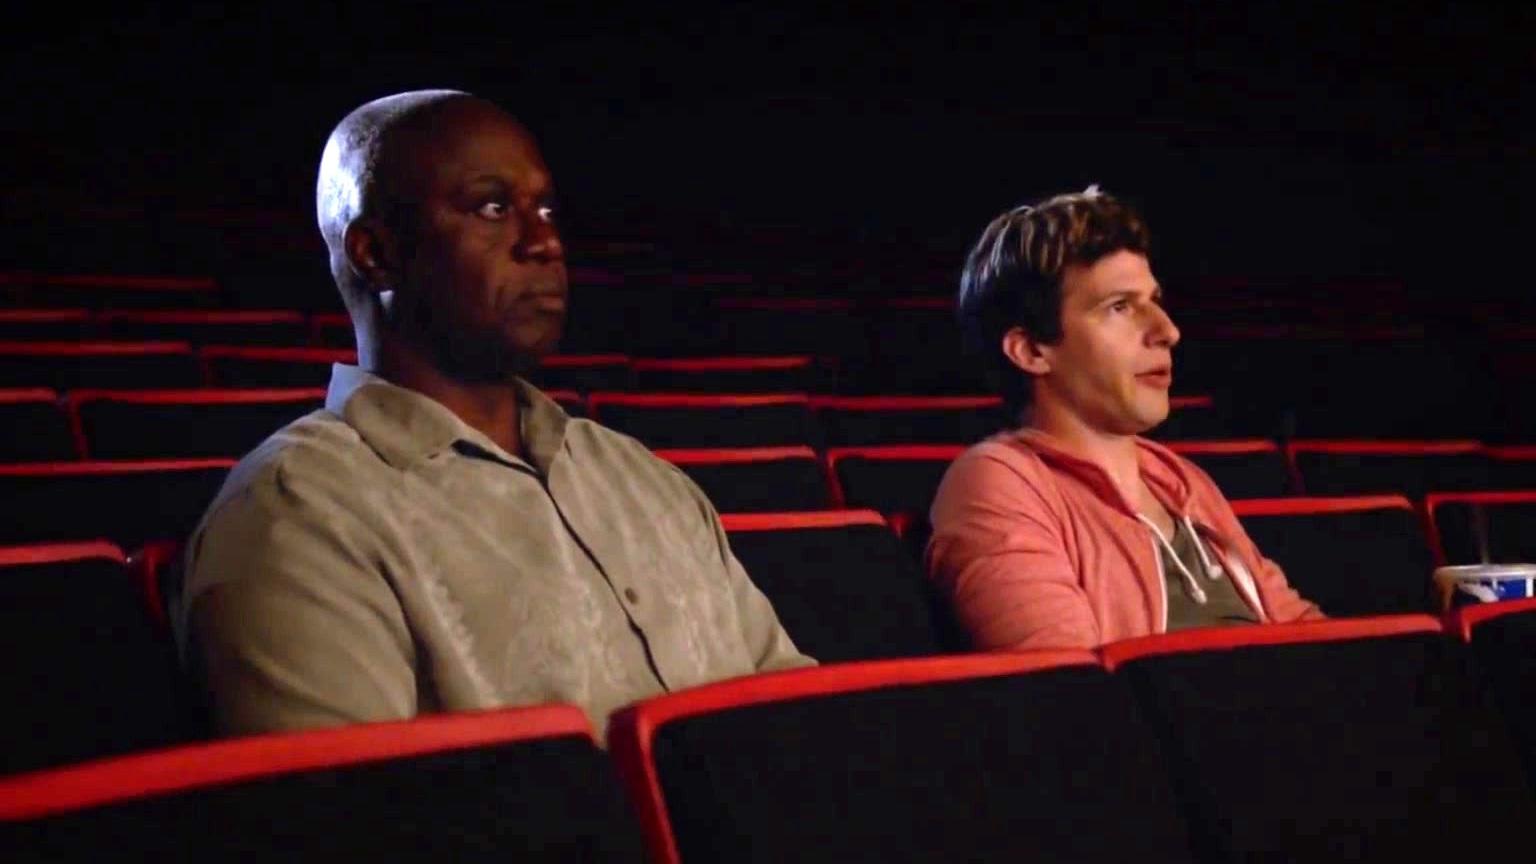 Brooklyn Nine-Nine: Marshal Haas Making Things Awkward